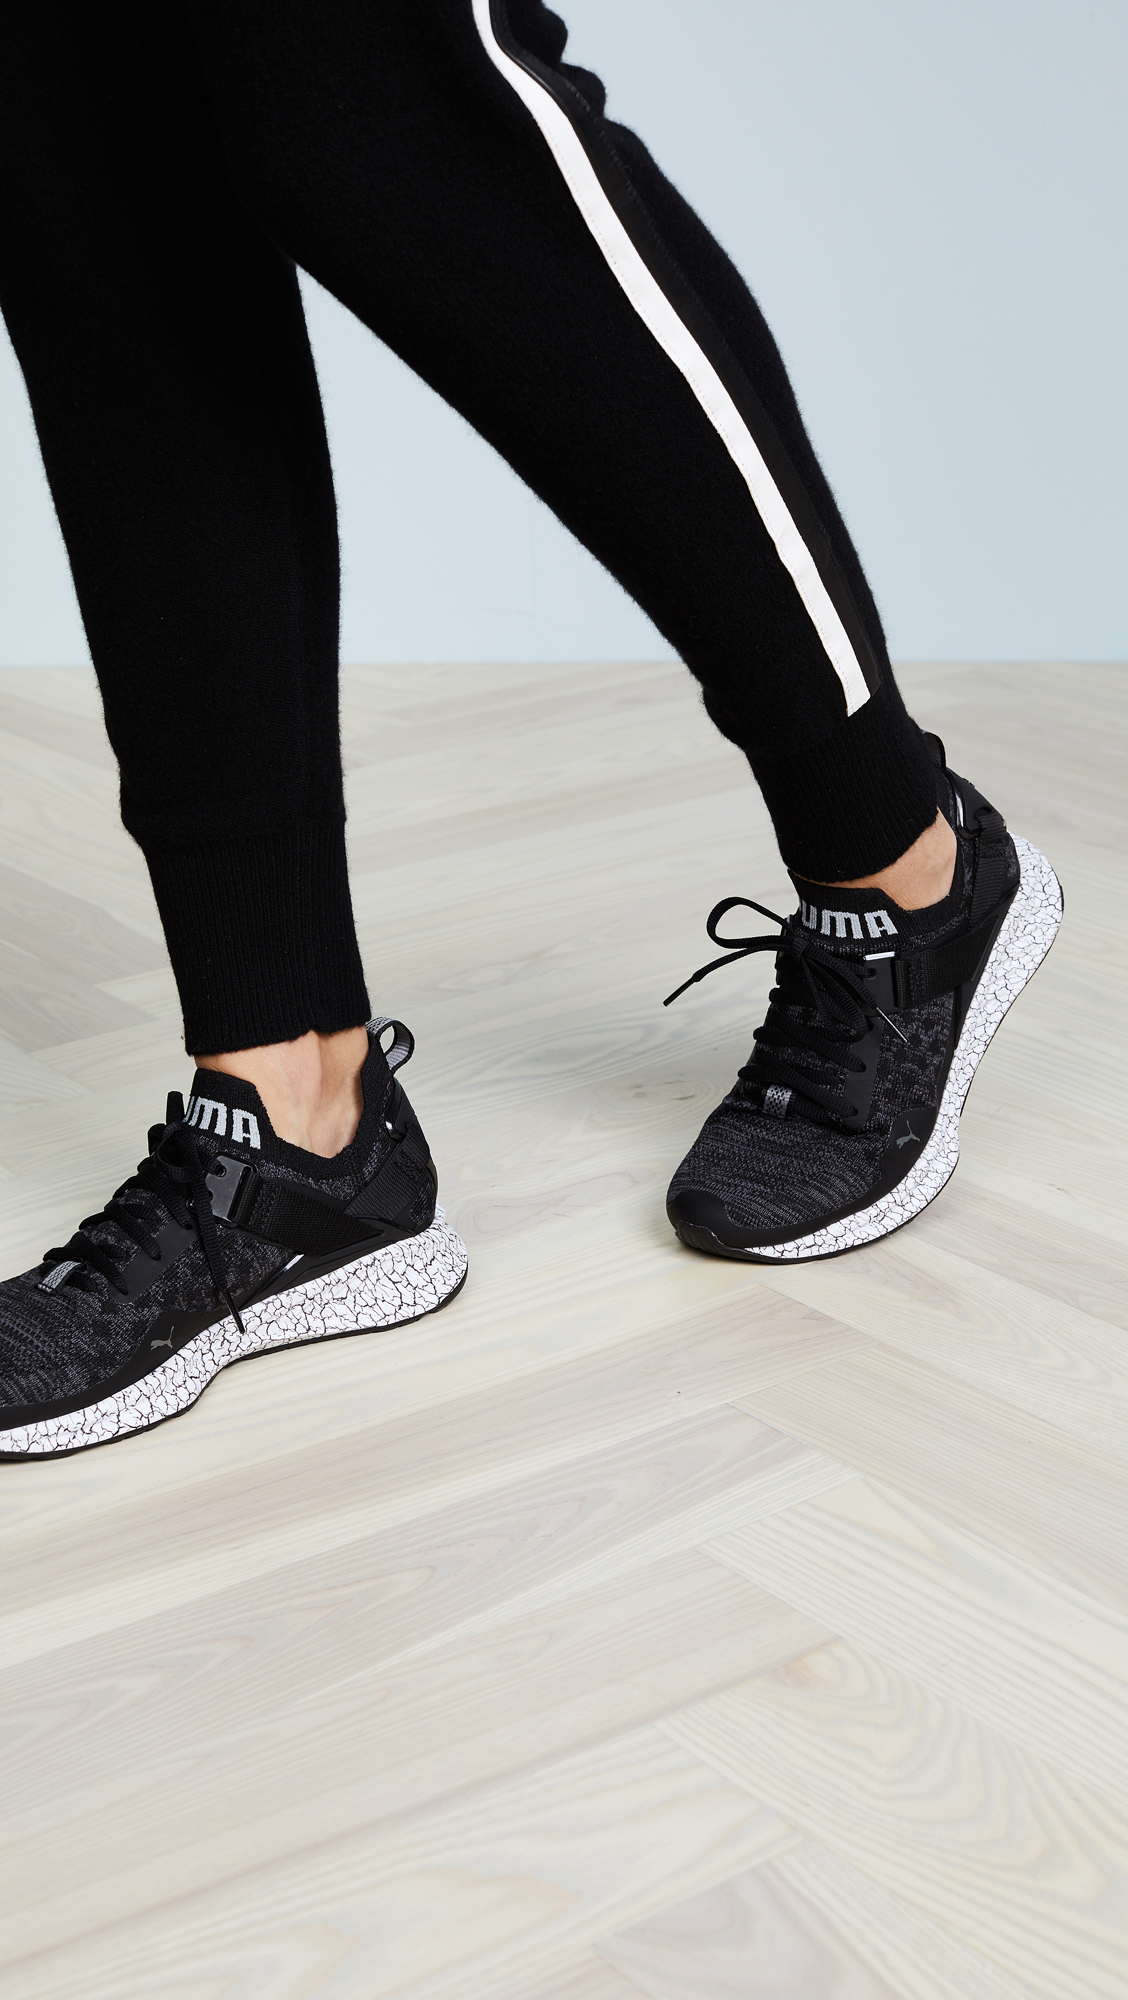 PUMA Ignite evoKNIT Lo Hypernature Sneakers  28cf643cb